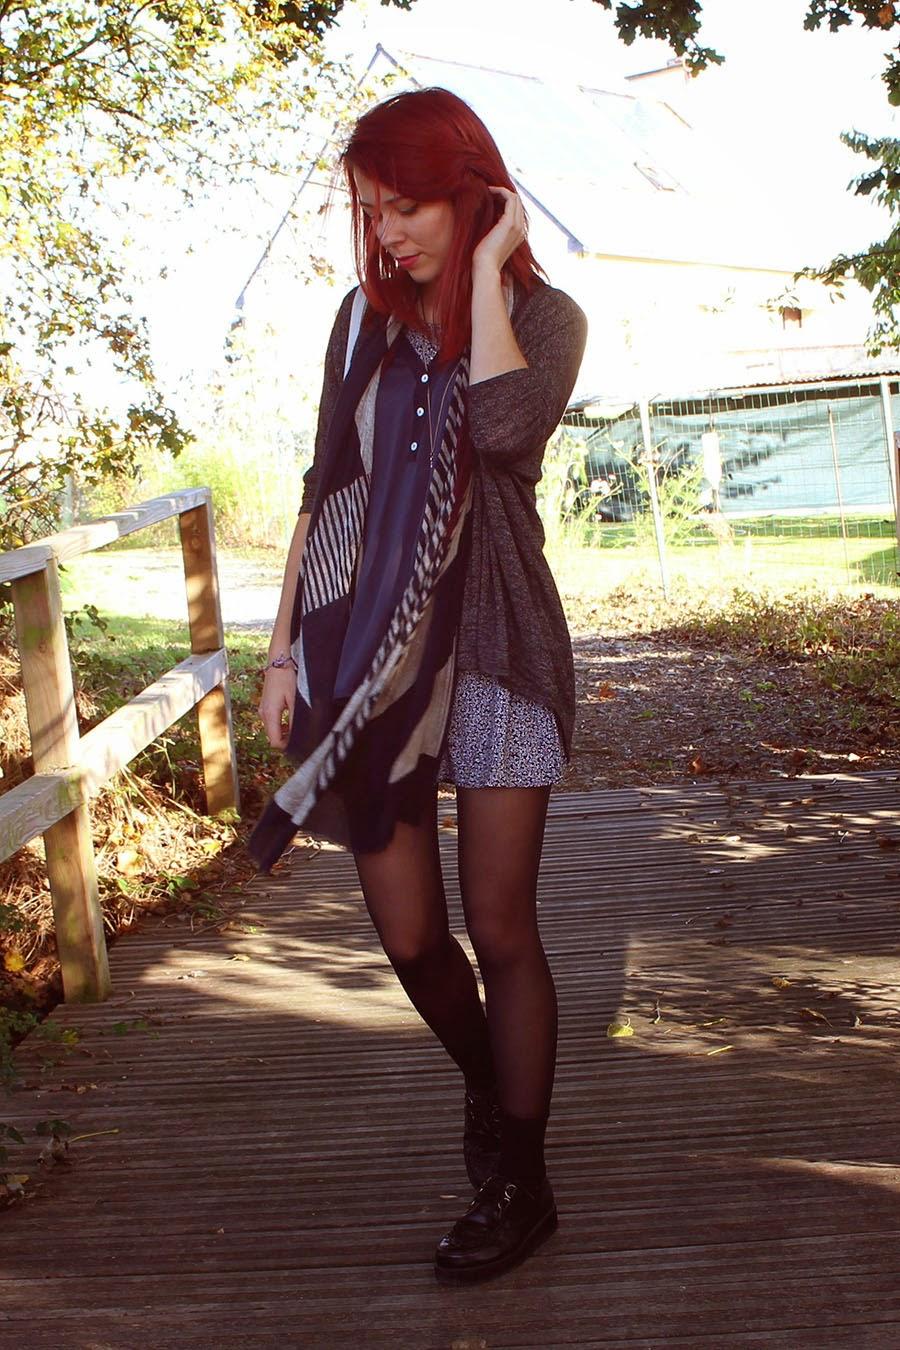 autumnal outfit, fall, jennifet, kimono, redhair, ootd, brezh, smock dress, h&m, bijoux brigitte, army, kaki, burgungy, bordeau, creepers, grunge, style, enjoyk, crystal, amethist, rennes, la creme, tote bag,